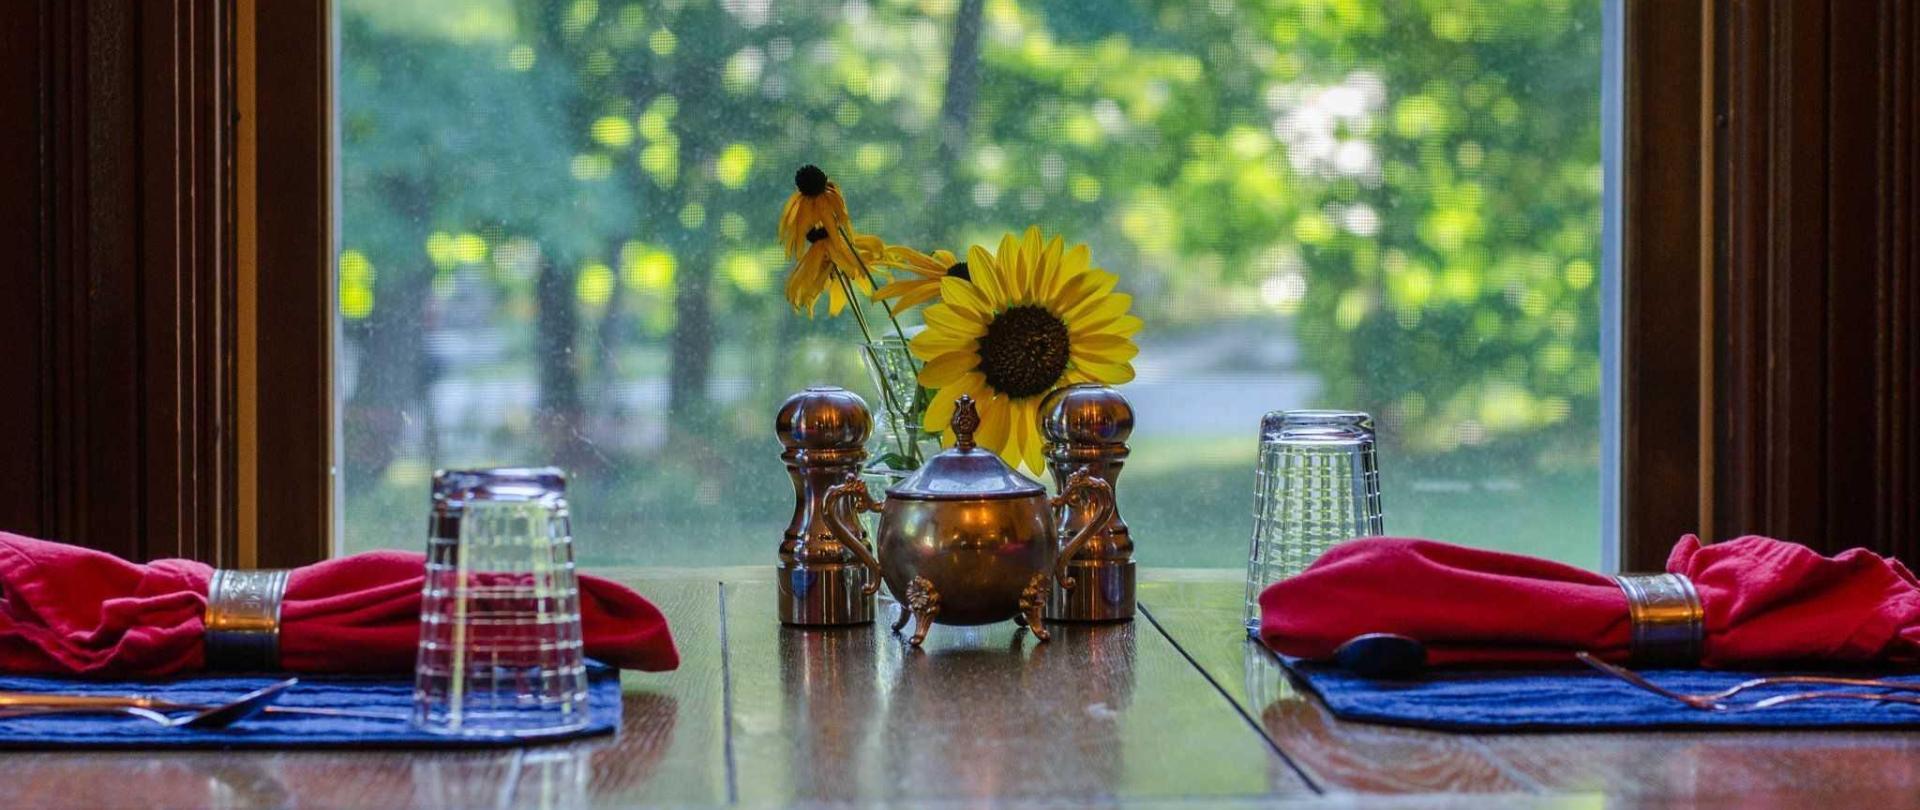 heart-of-the-village-inn-maininn_breakfastrooms6.jpg